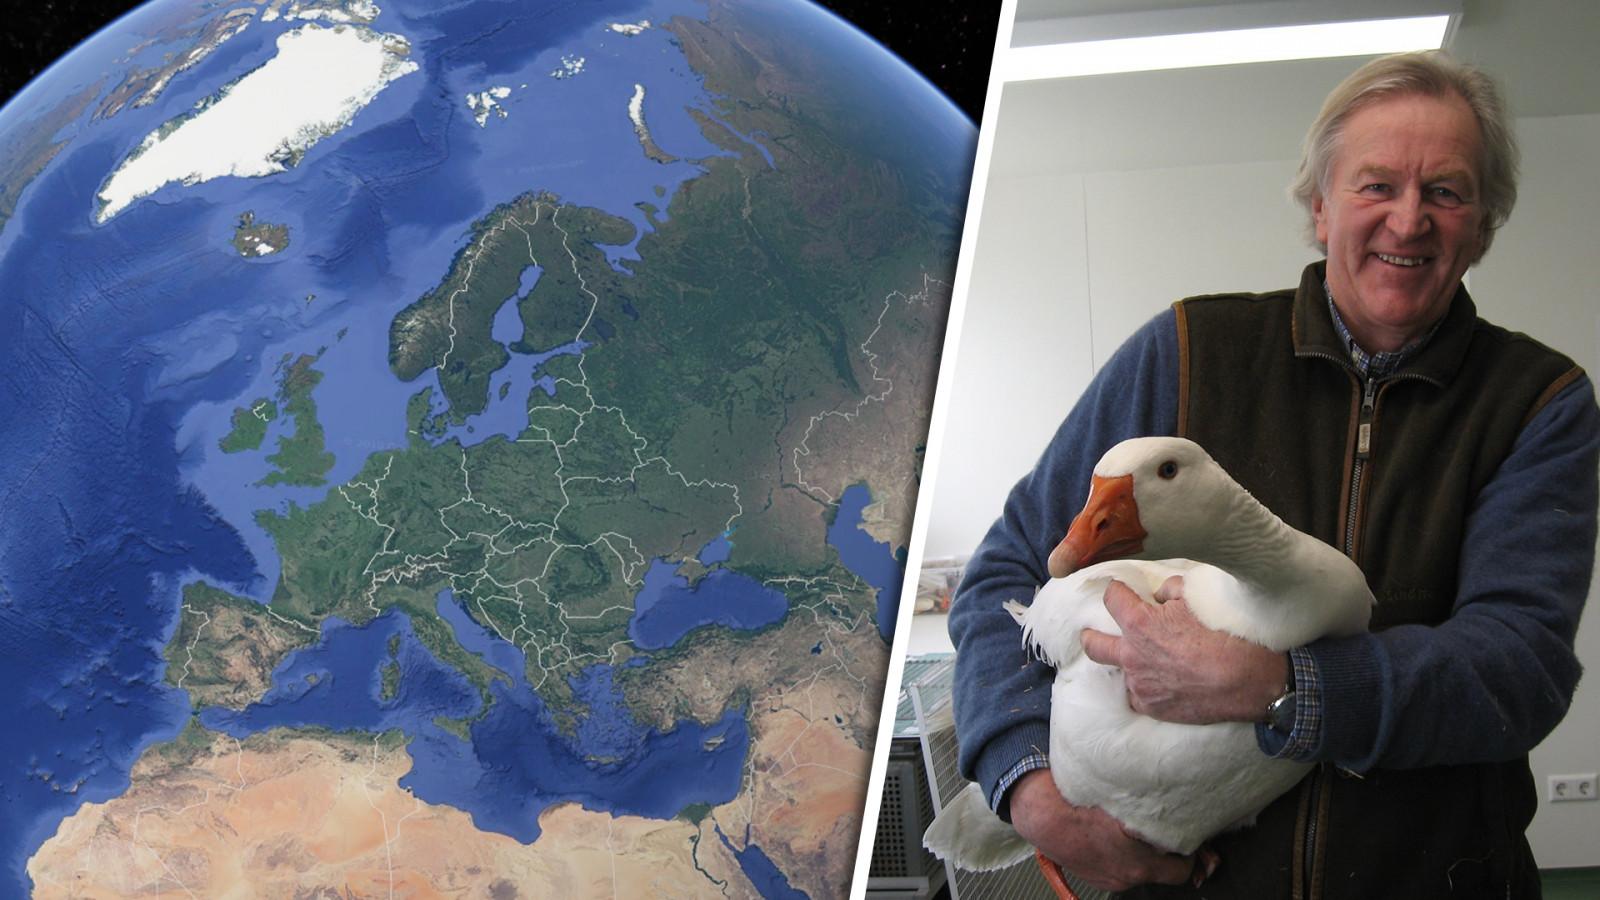 Vogelhospitaal/Maria Elisa Hobbelink & Google Earth